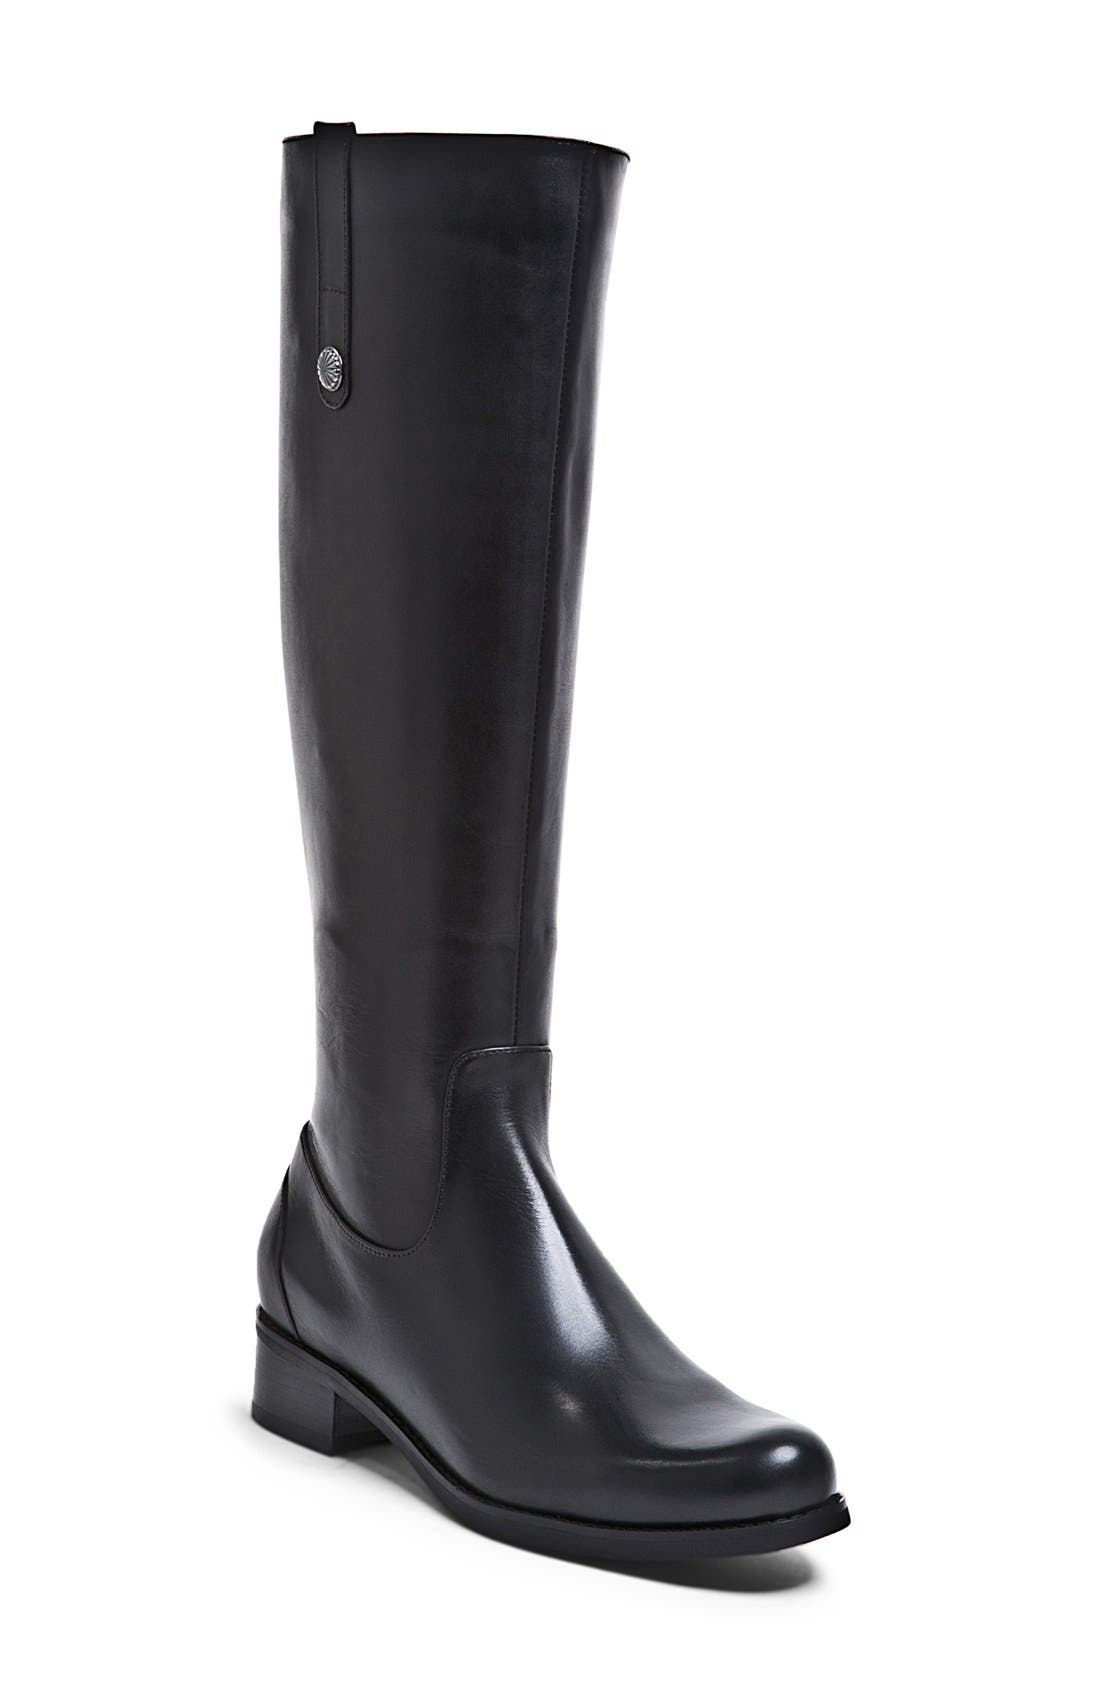 Main Image - Blondo 'Victorina' Waterproof Leather Riding Boot (Women)